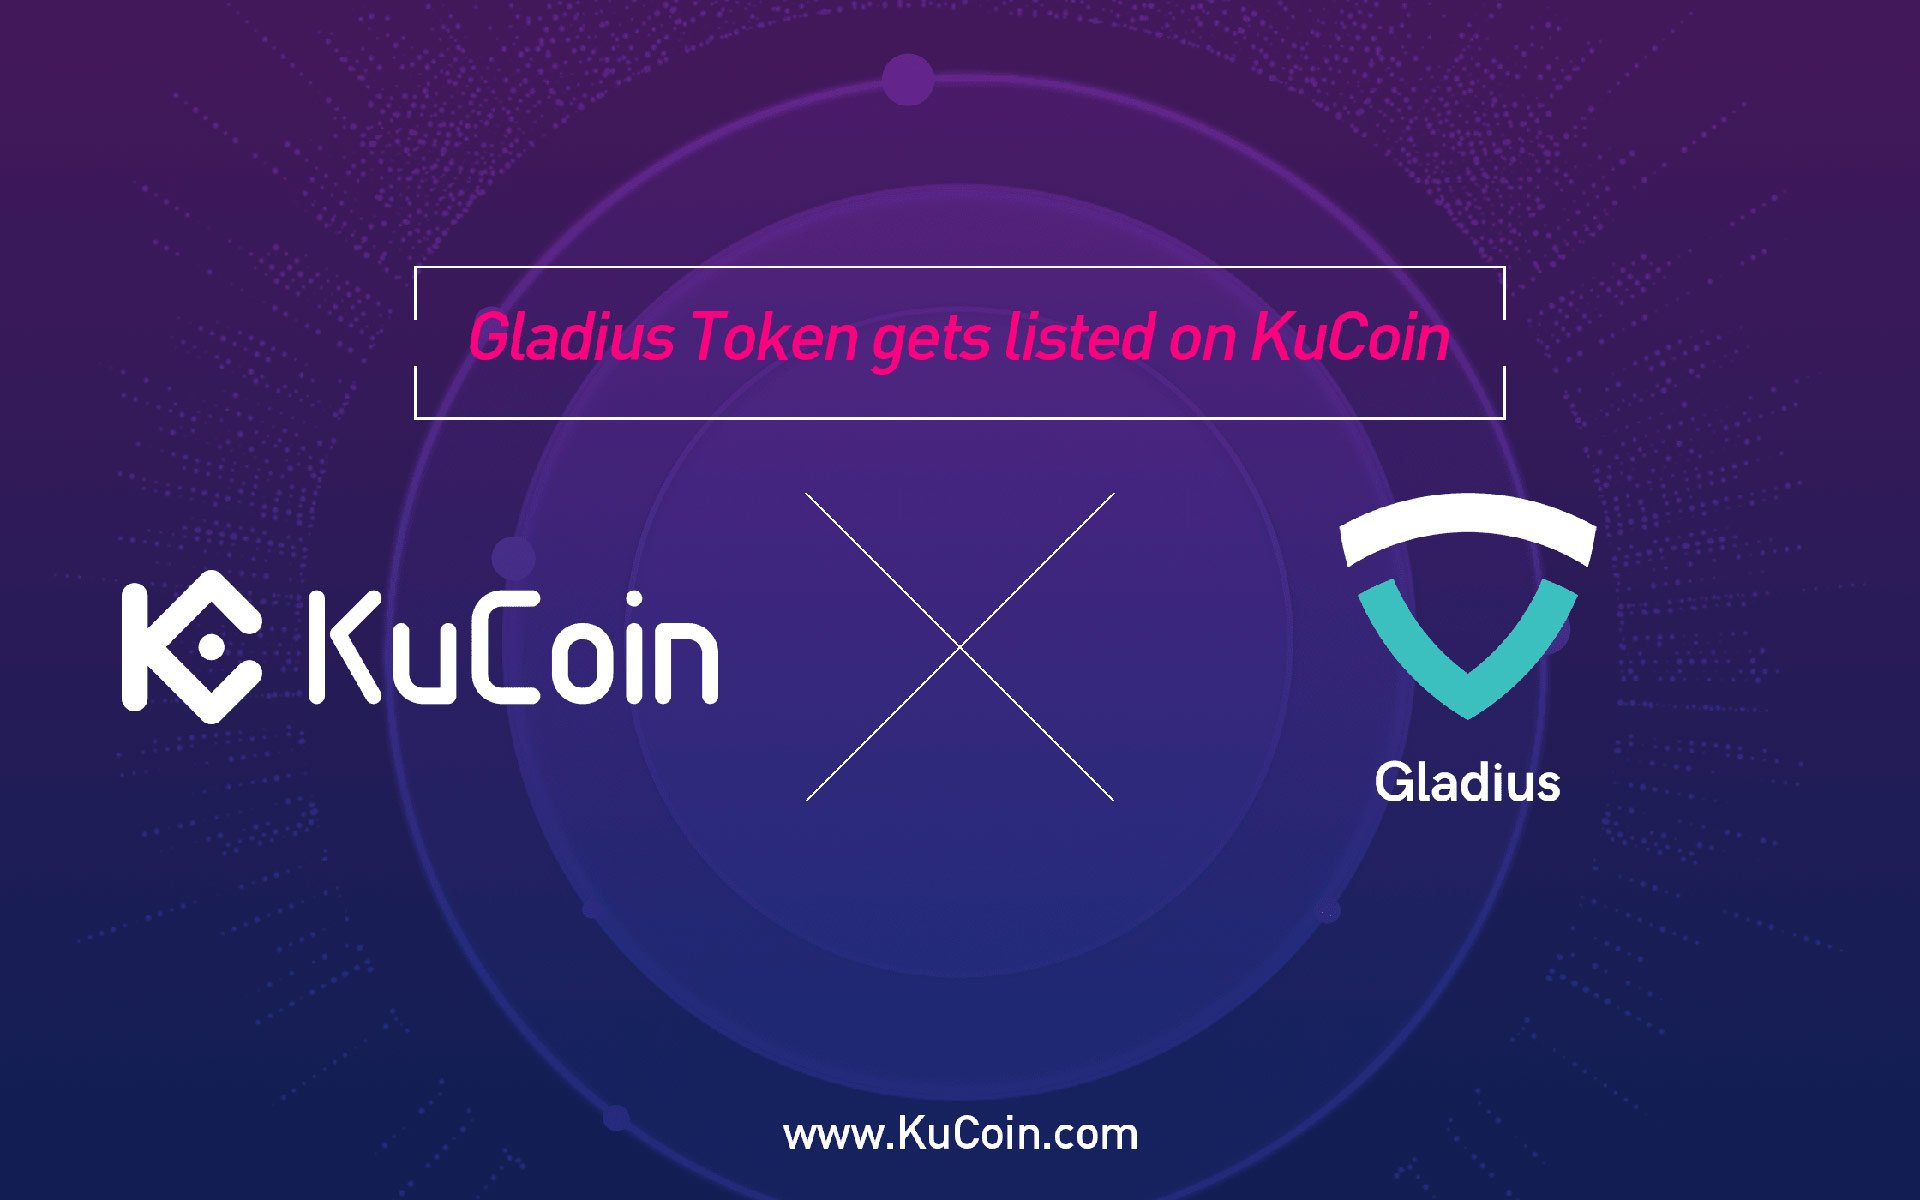 Gladius Token(GLA) Gets Listed on KuCoin!